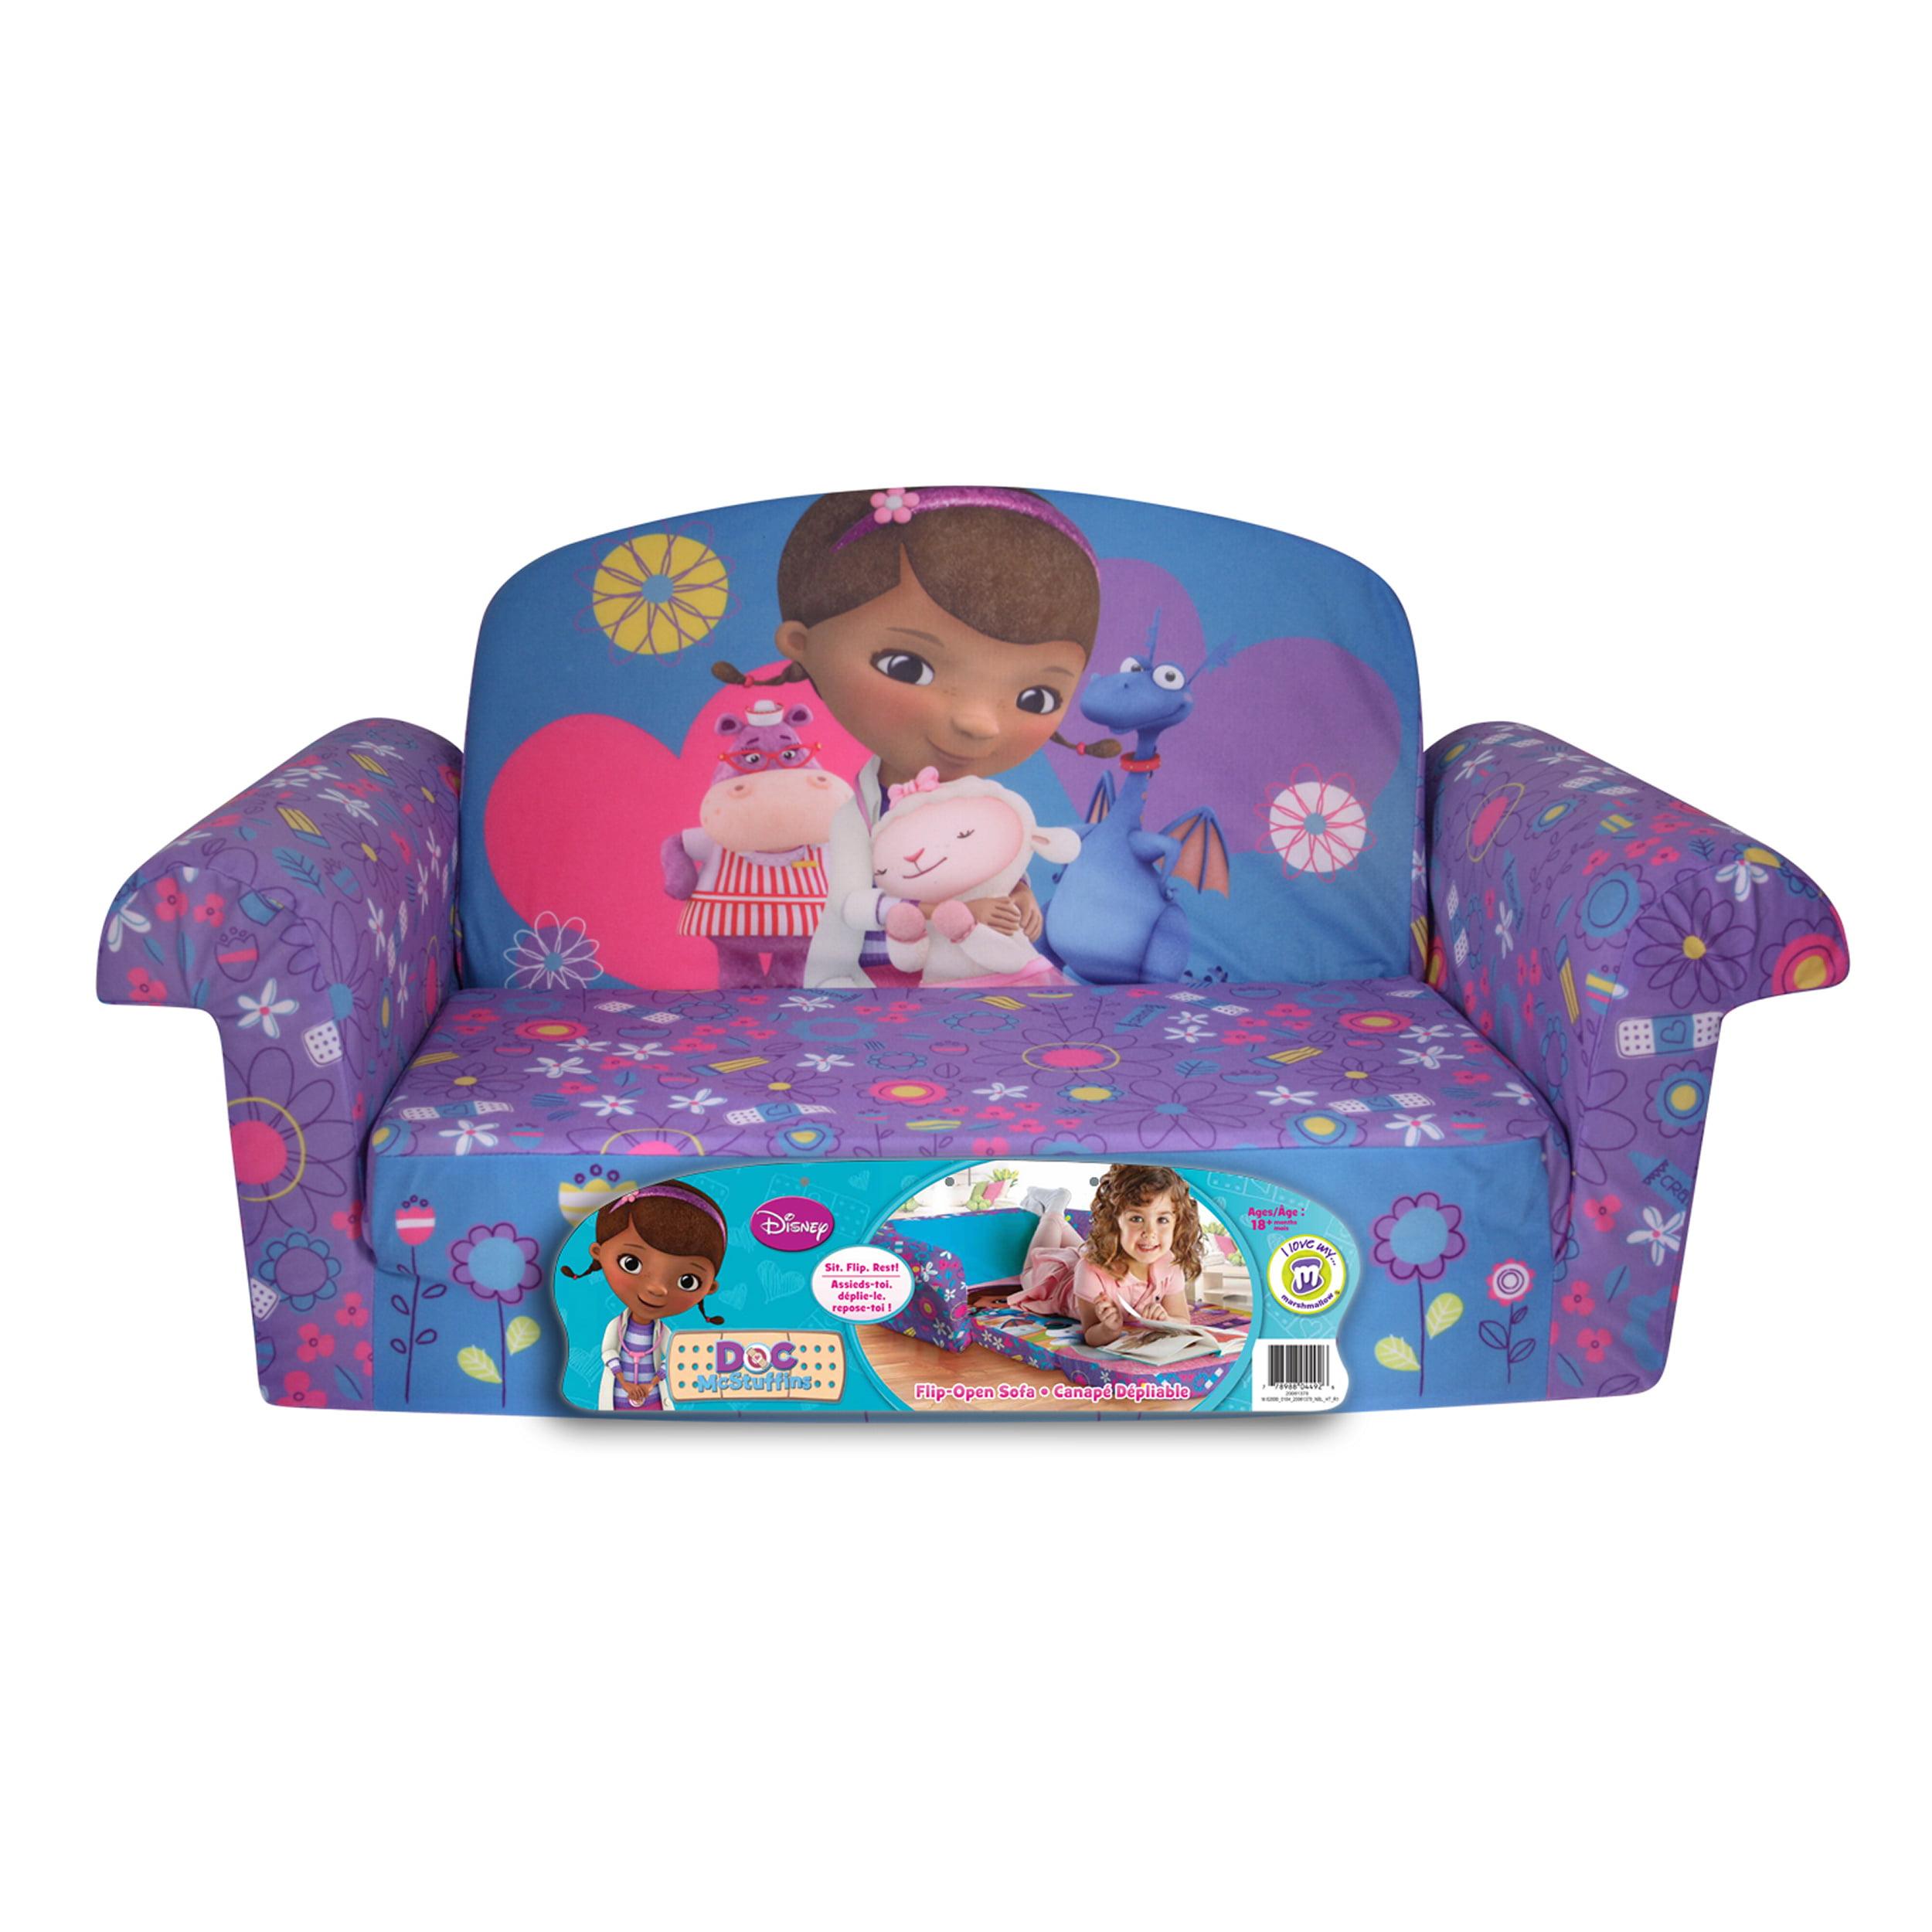 Marshmallow Furniture, Children's 2 in 1 Flip Open Foam Sofa, Disney Doc  McStuffins, by Spin Master - Walmart.com